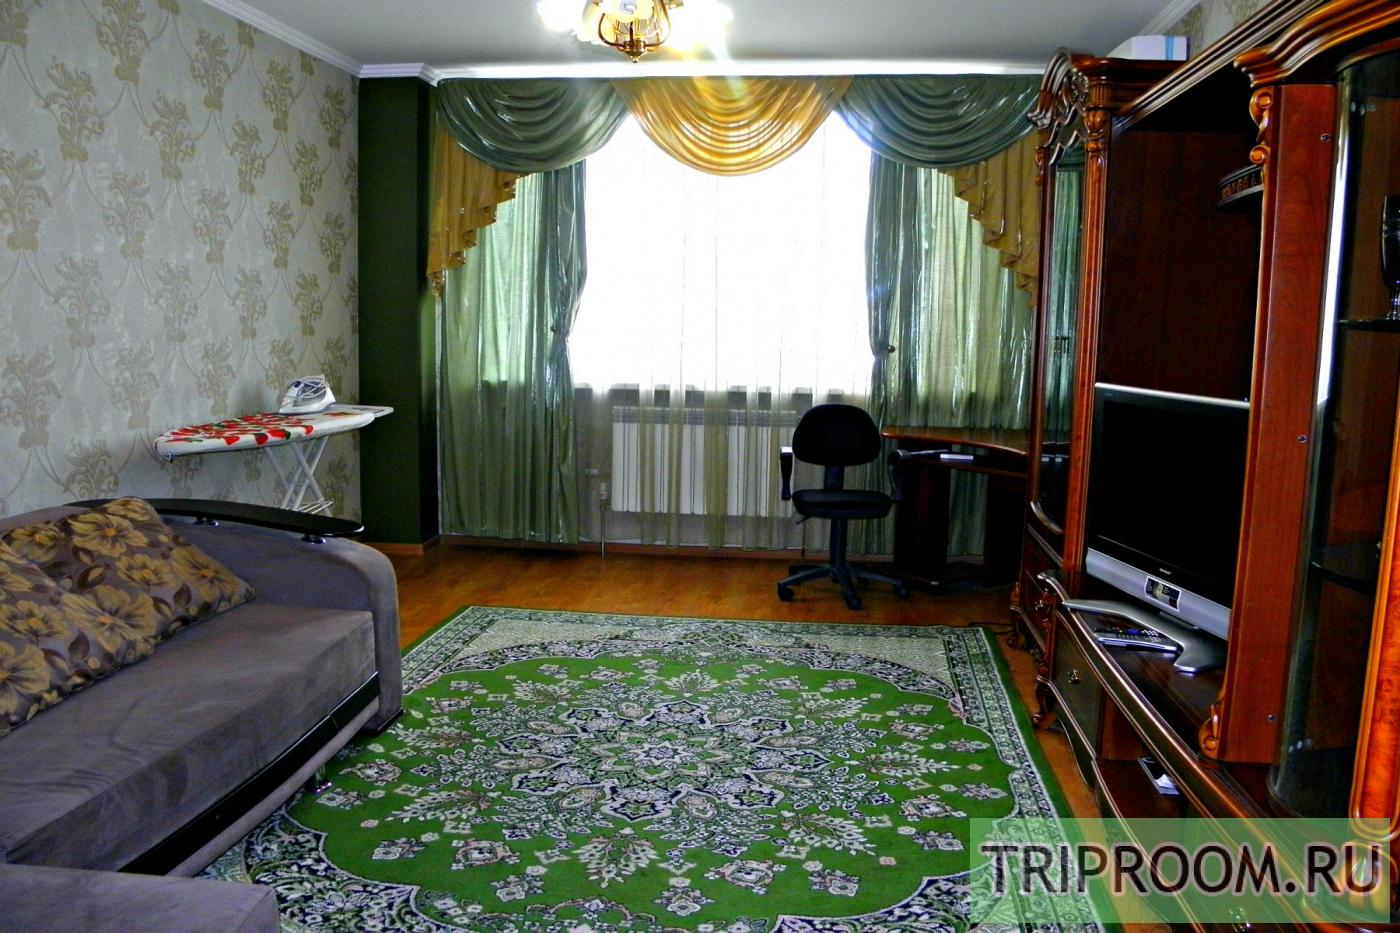 1-комнатная квартира посуточно (вариант № 18827), ул. Гвардейский переулок, фото № 13